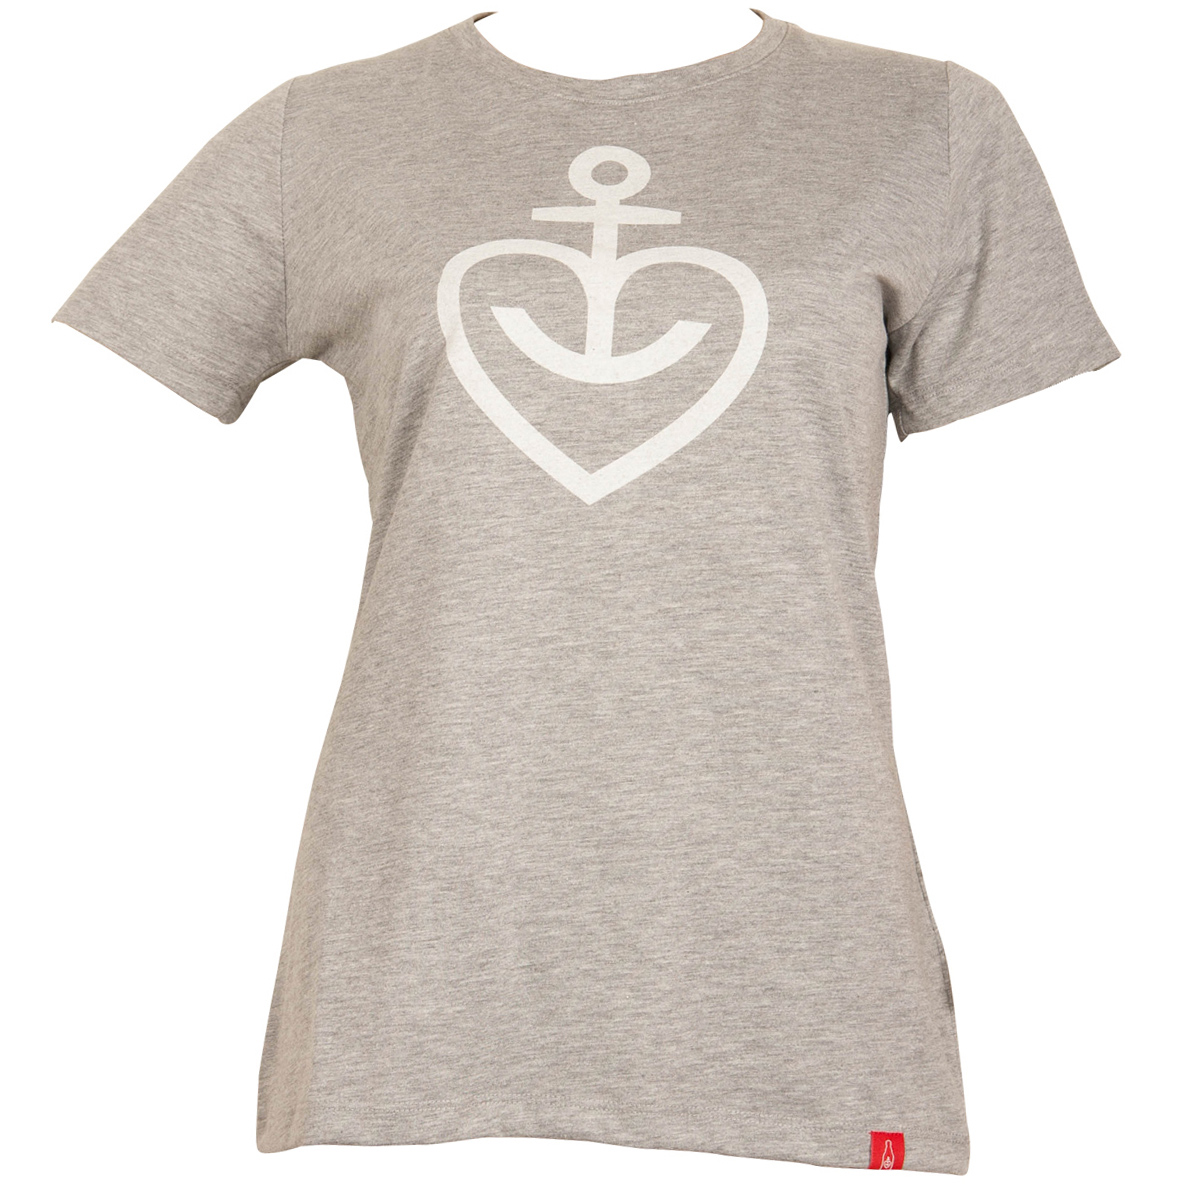 Astra - Damen T-Shirt Herzanker - grau